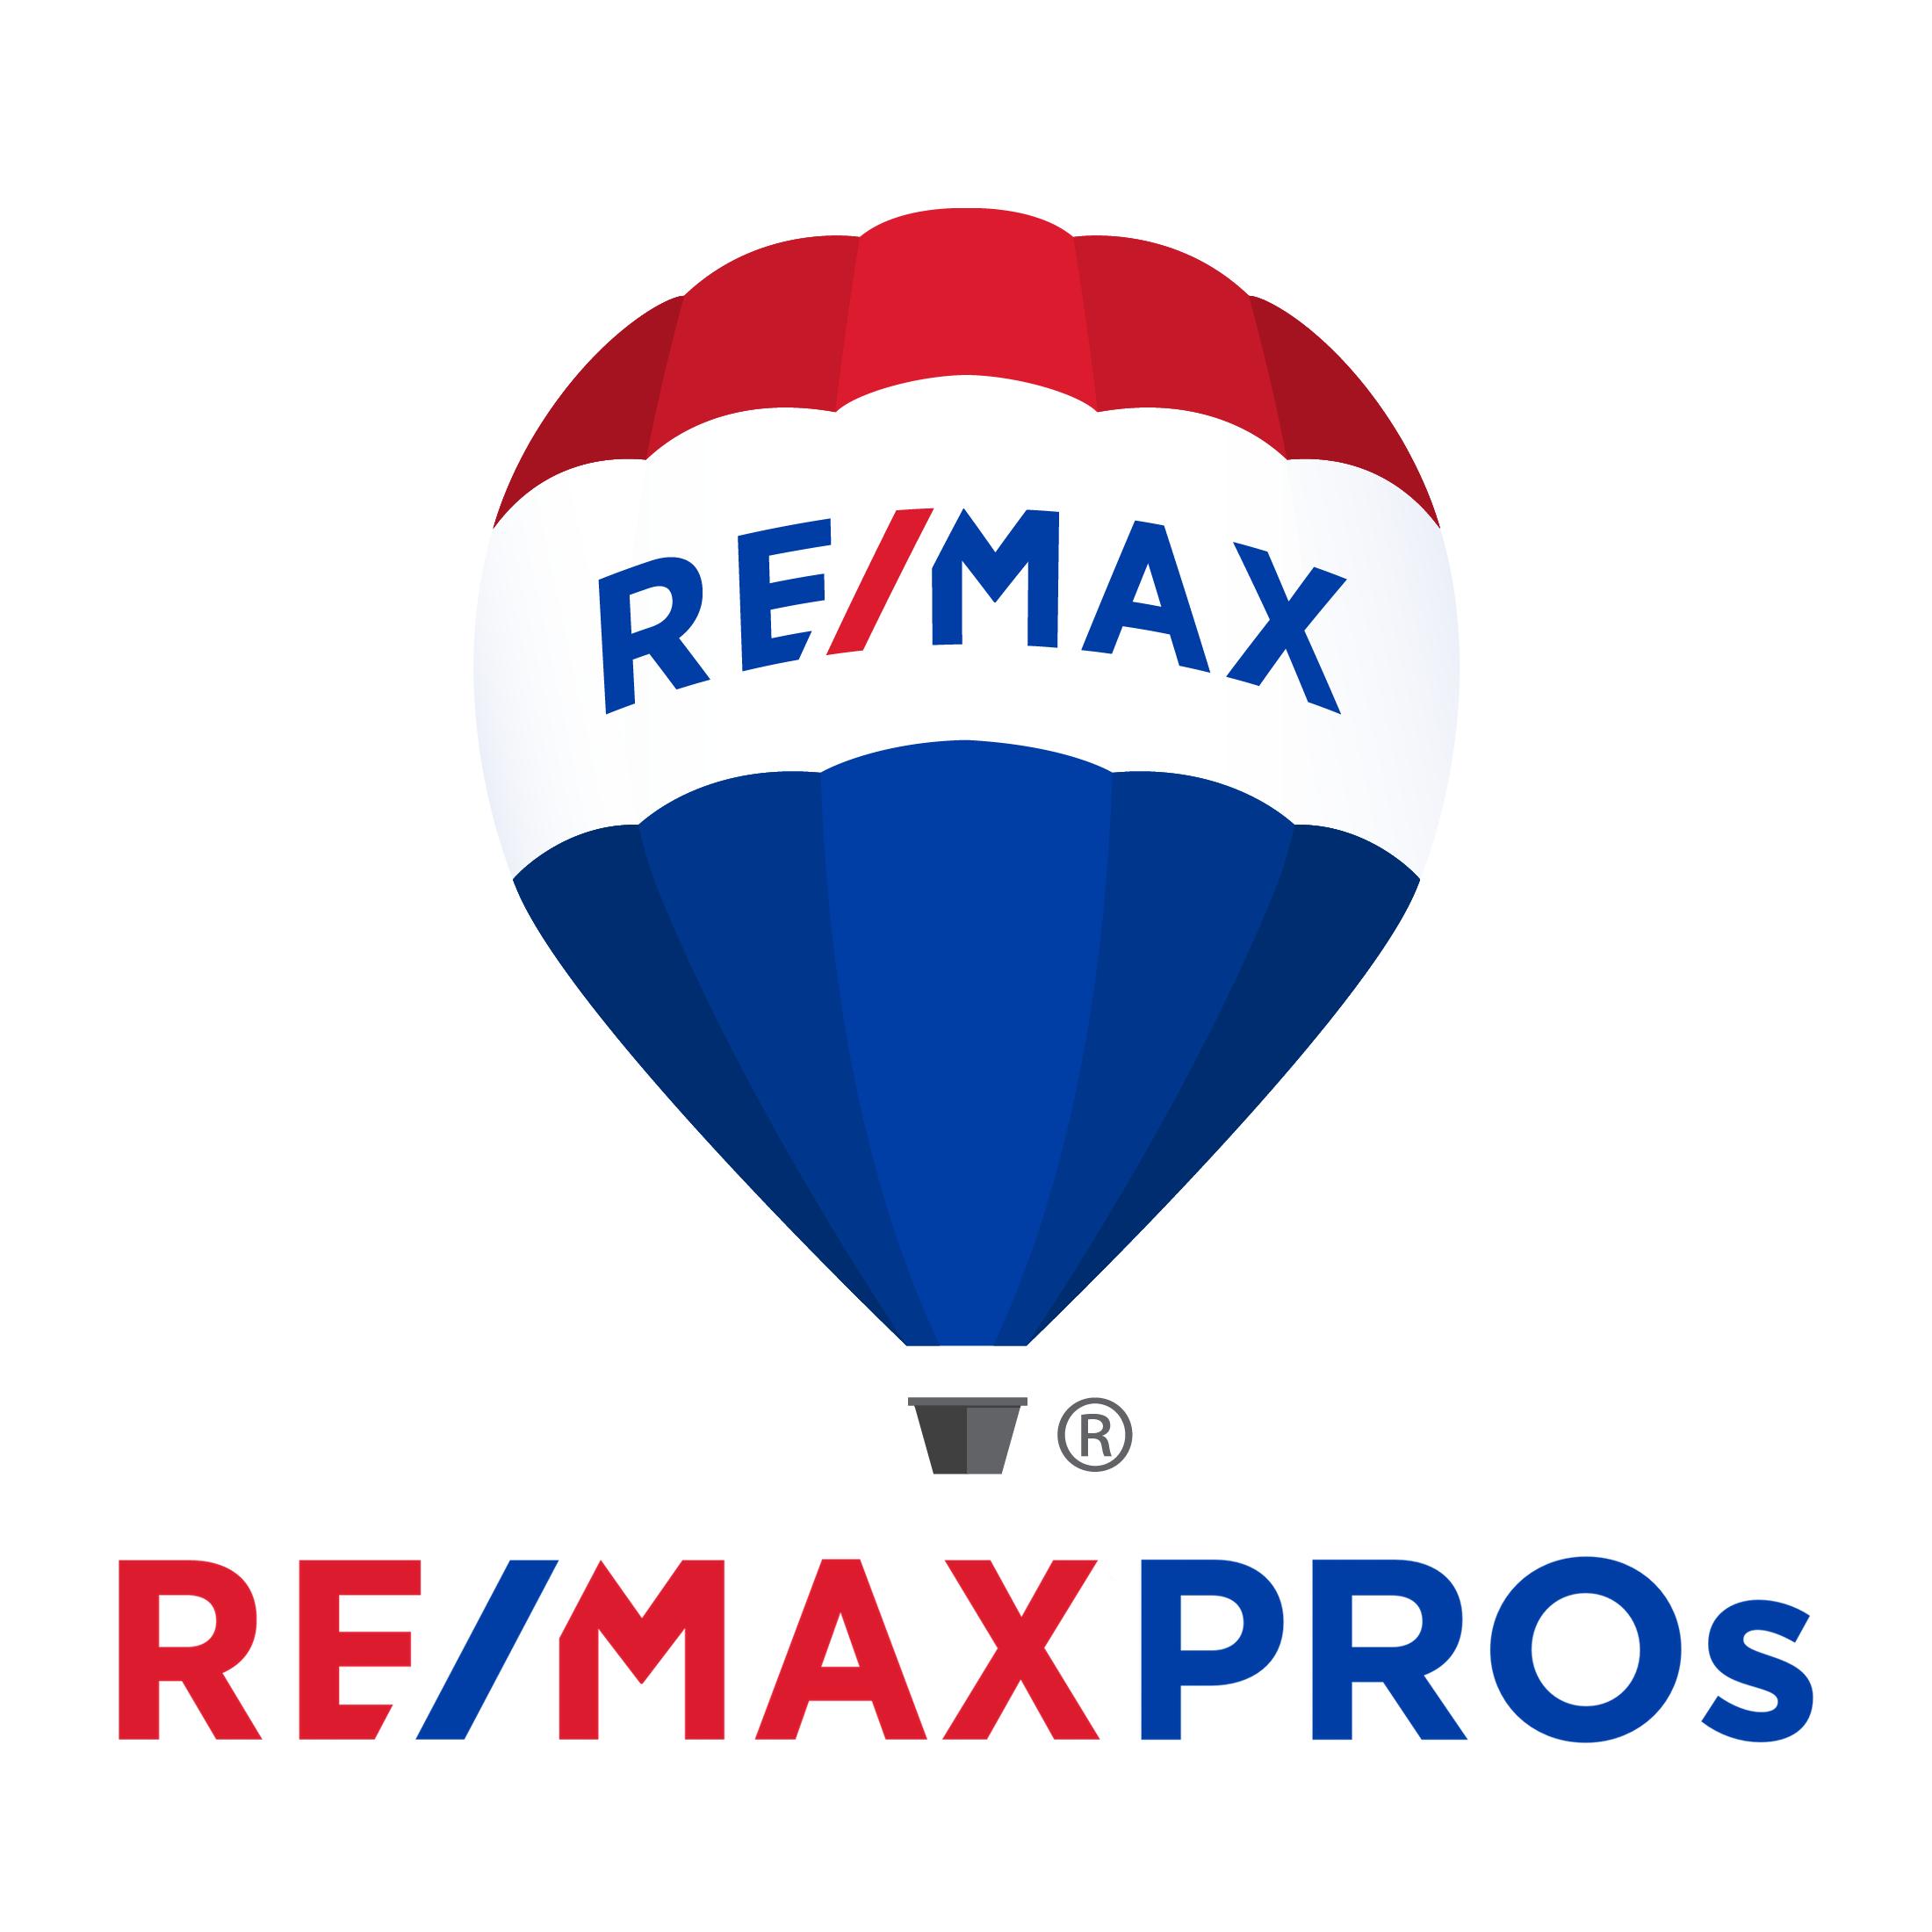 RE/MAX Pros